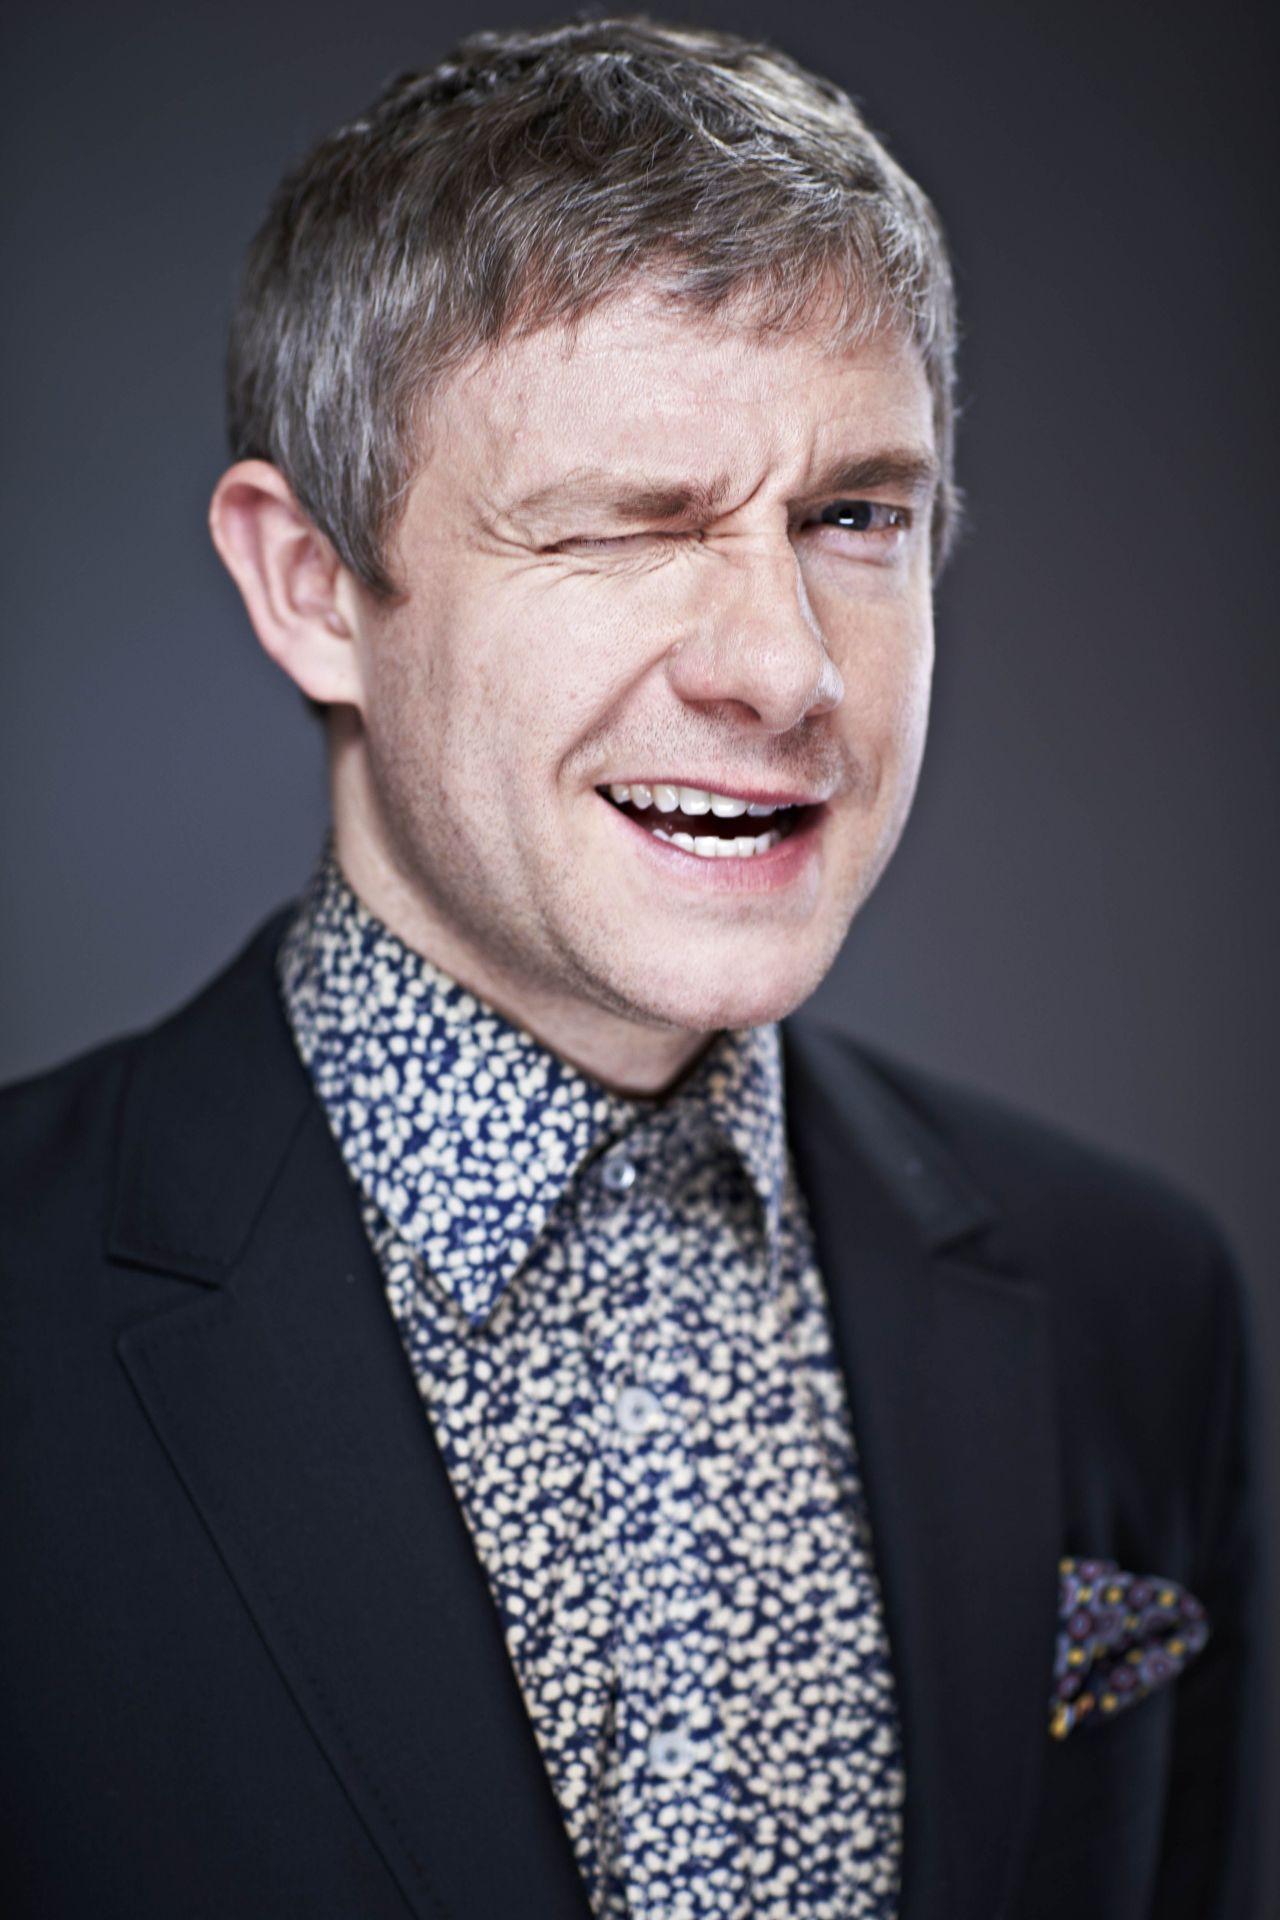 Sherlock Bbc Quotes Wallpaper Steven Moffat Martin Freeman Mark Gatiss Bbc Sherlock Cast